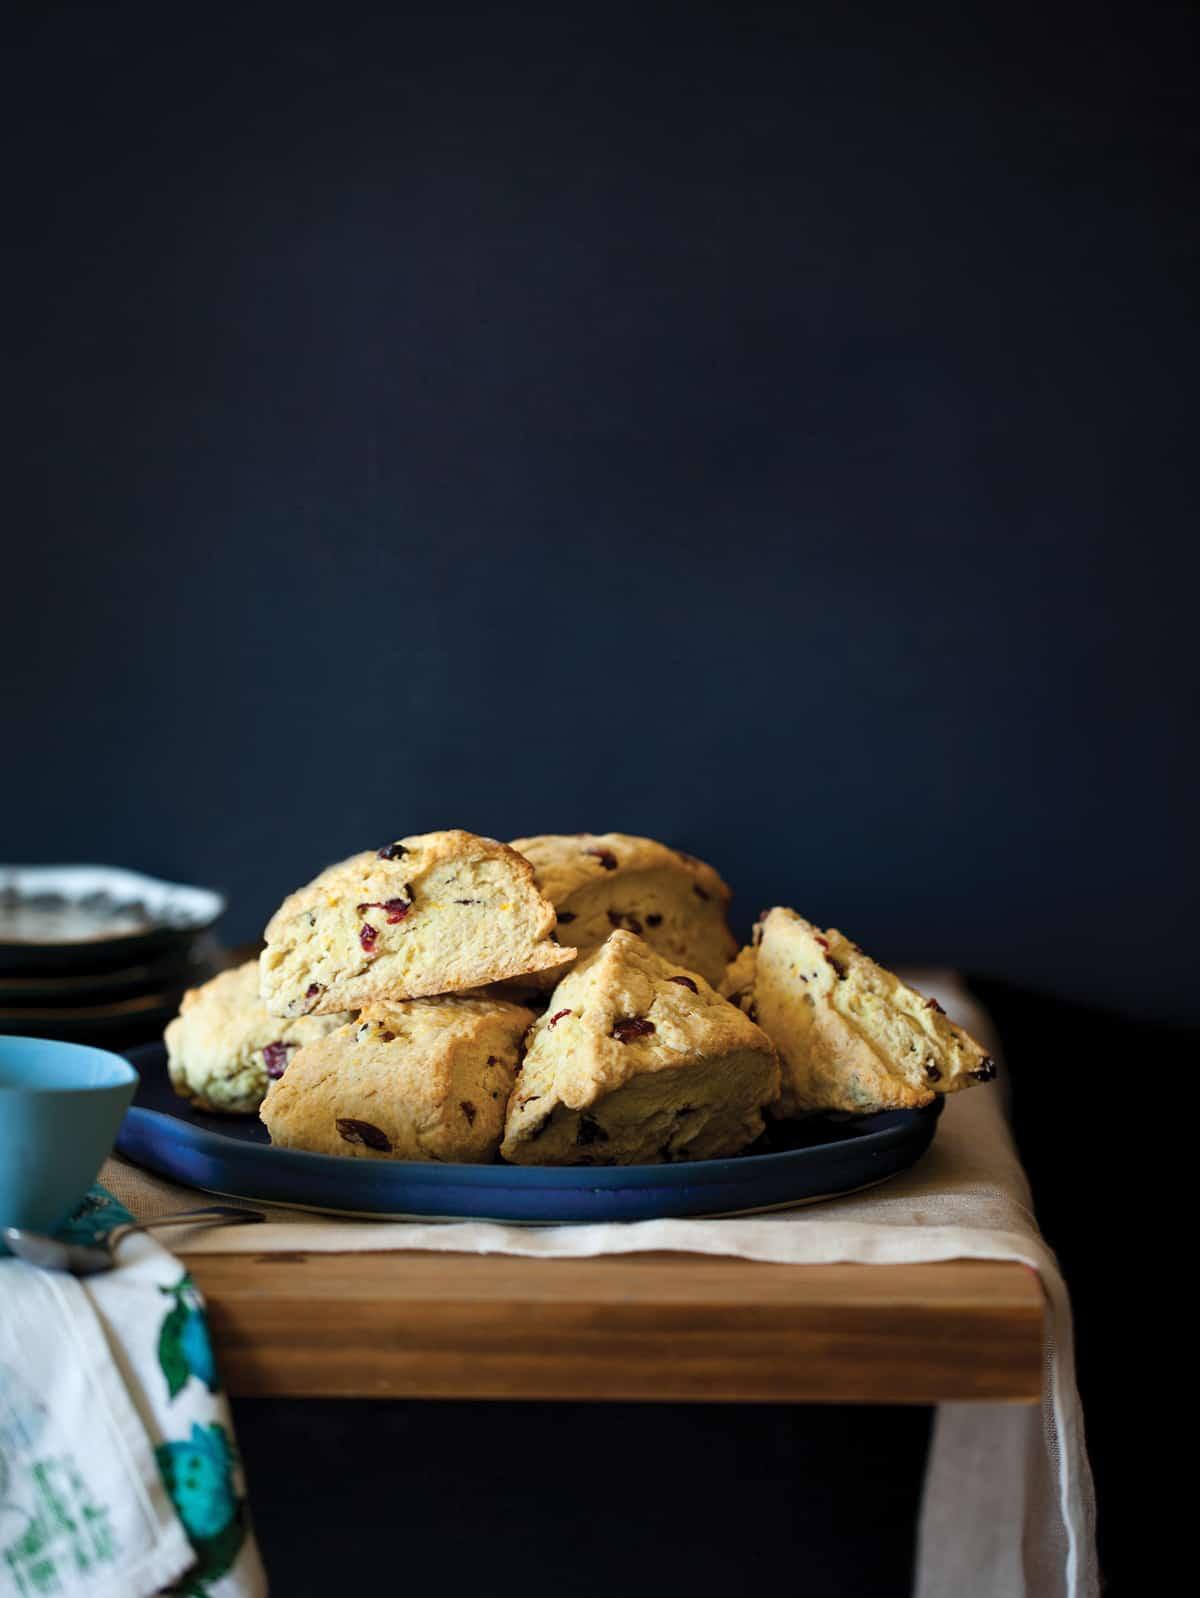 A recipe for Cranberry and Orange Scones.